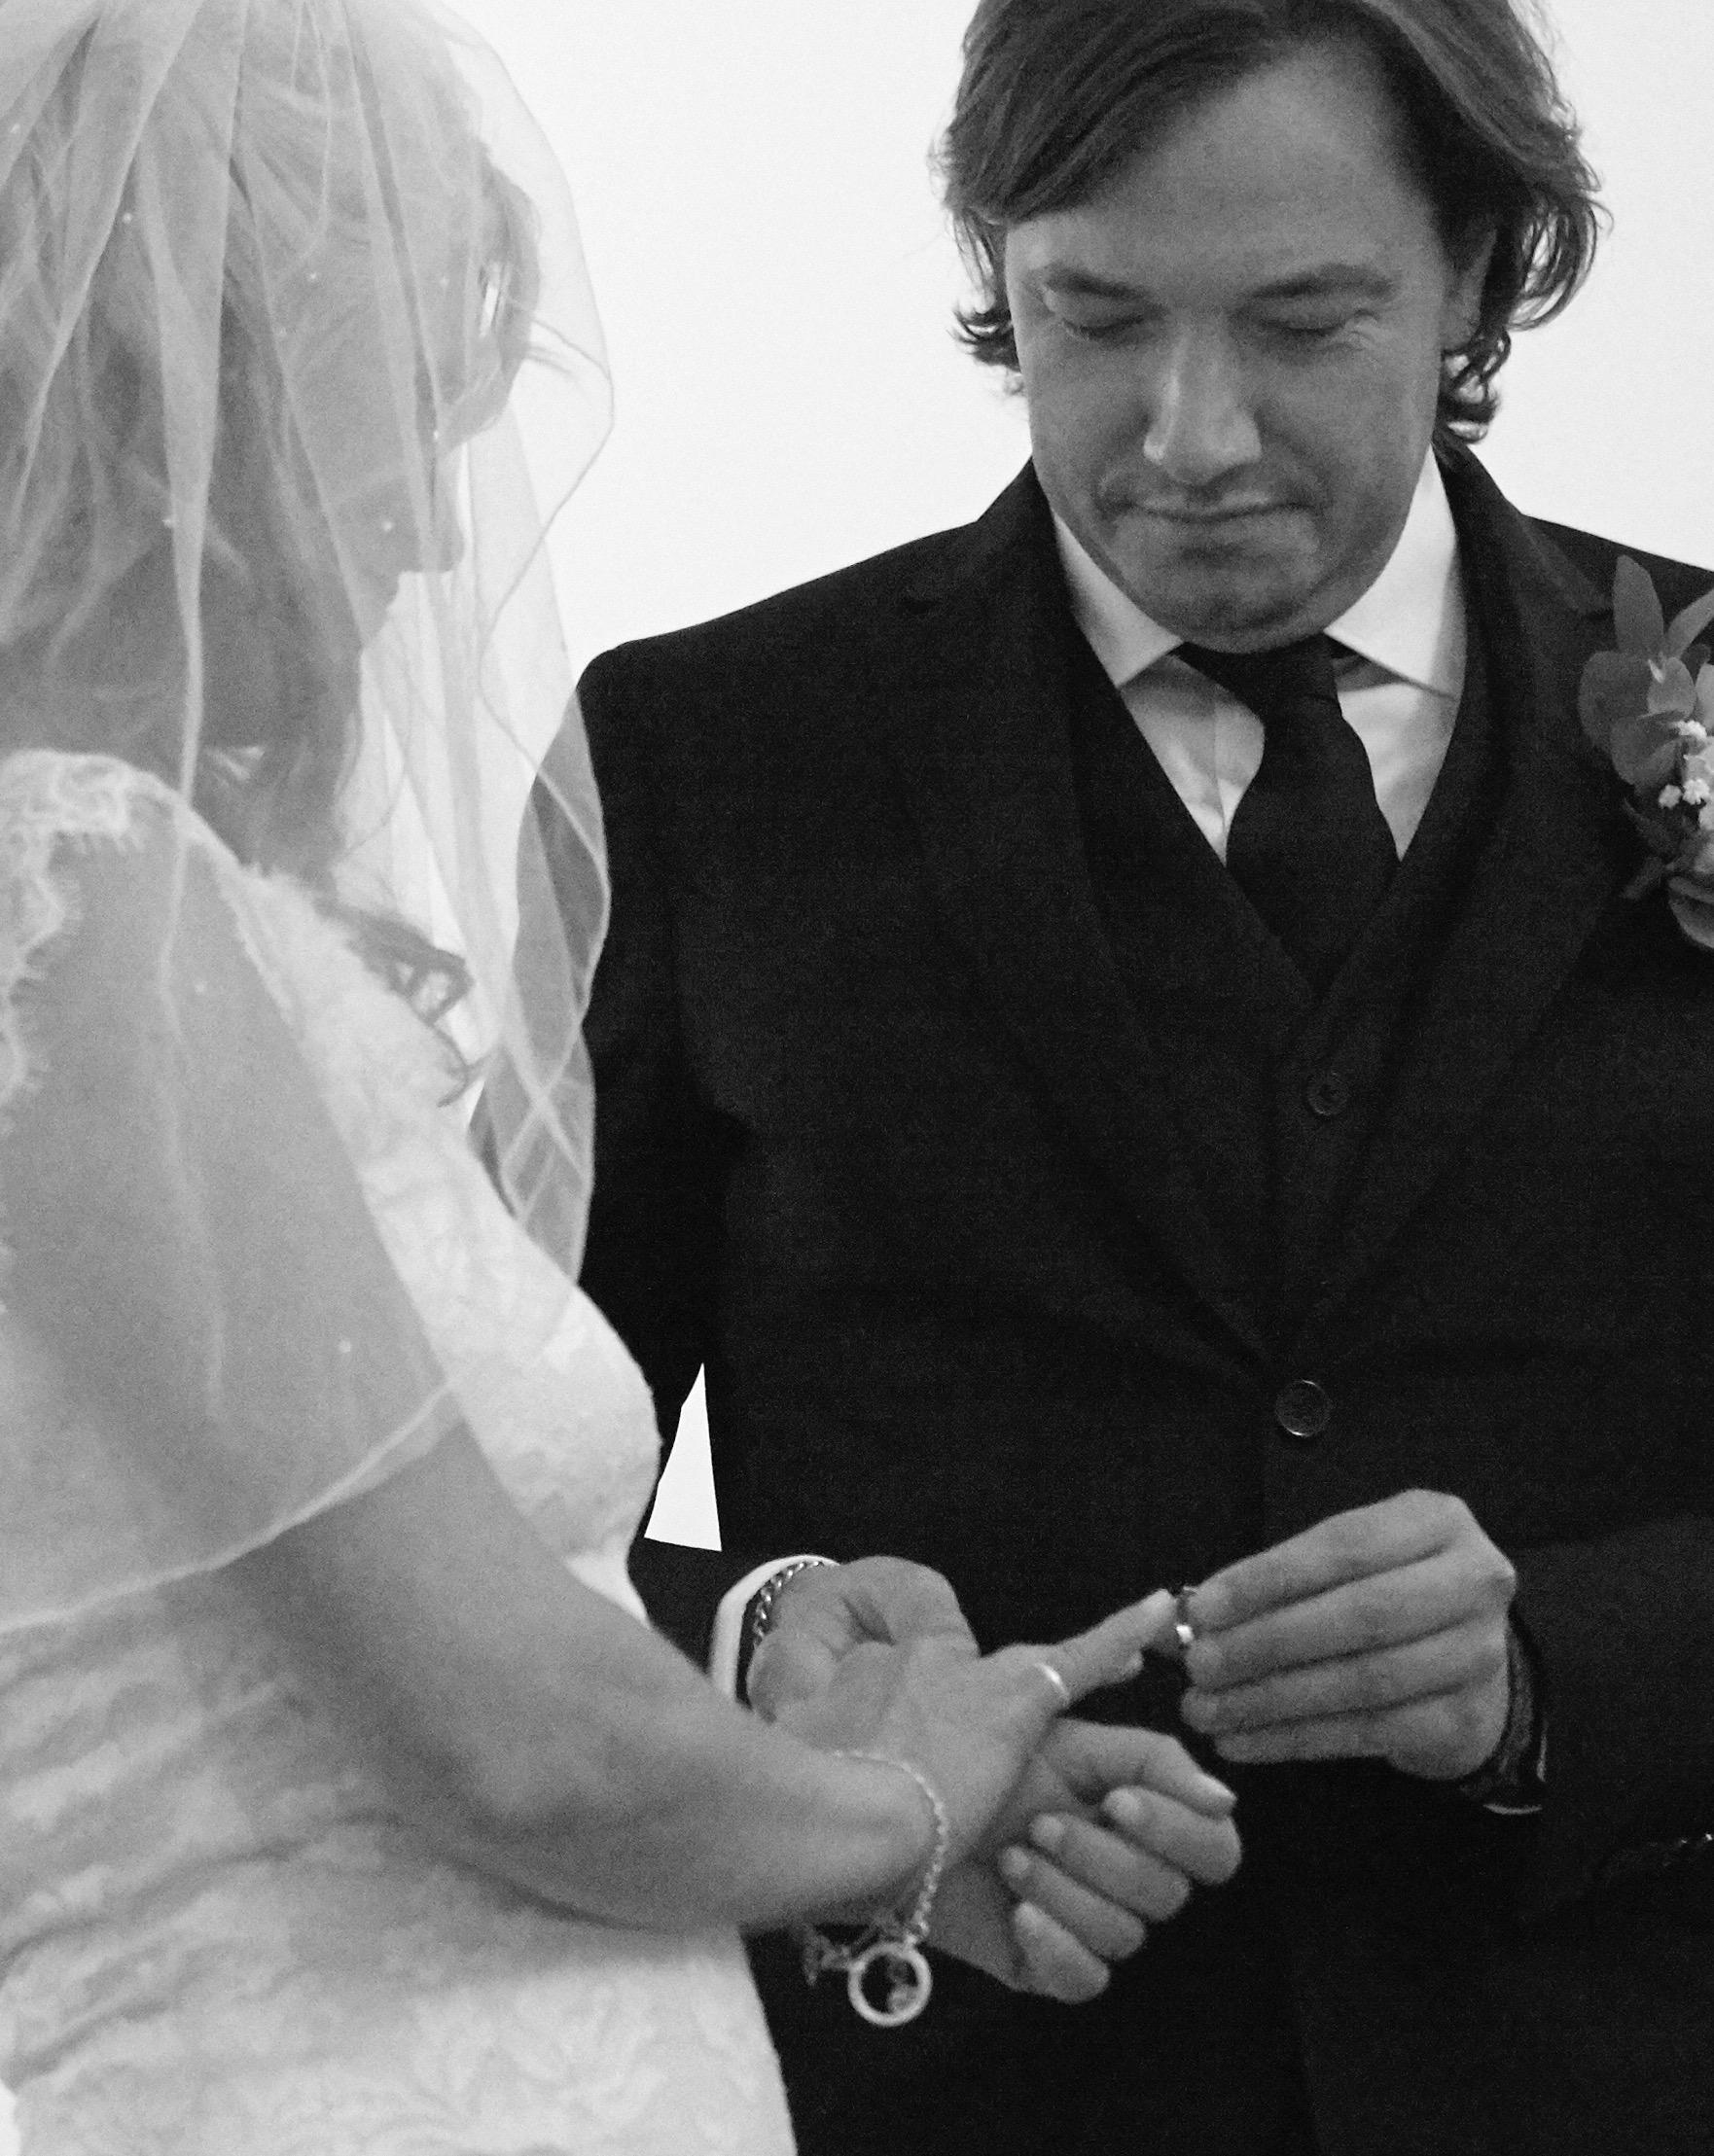 lone bryllup 159.jpg